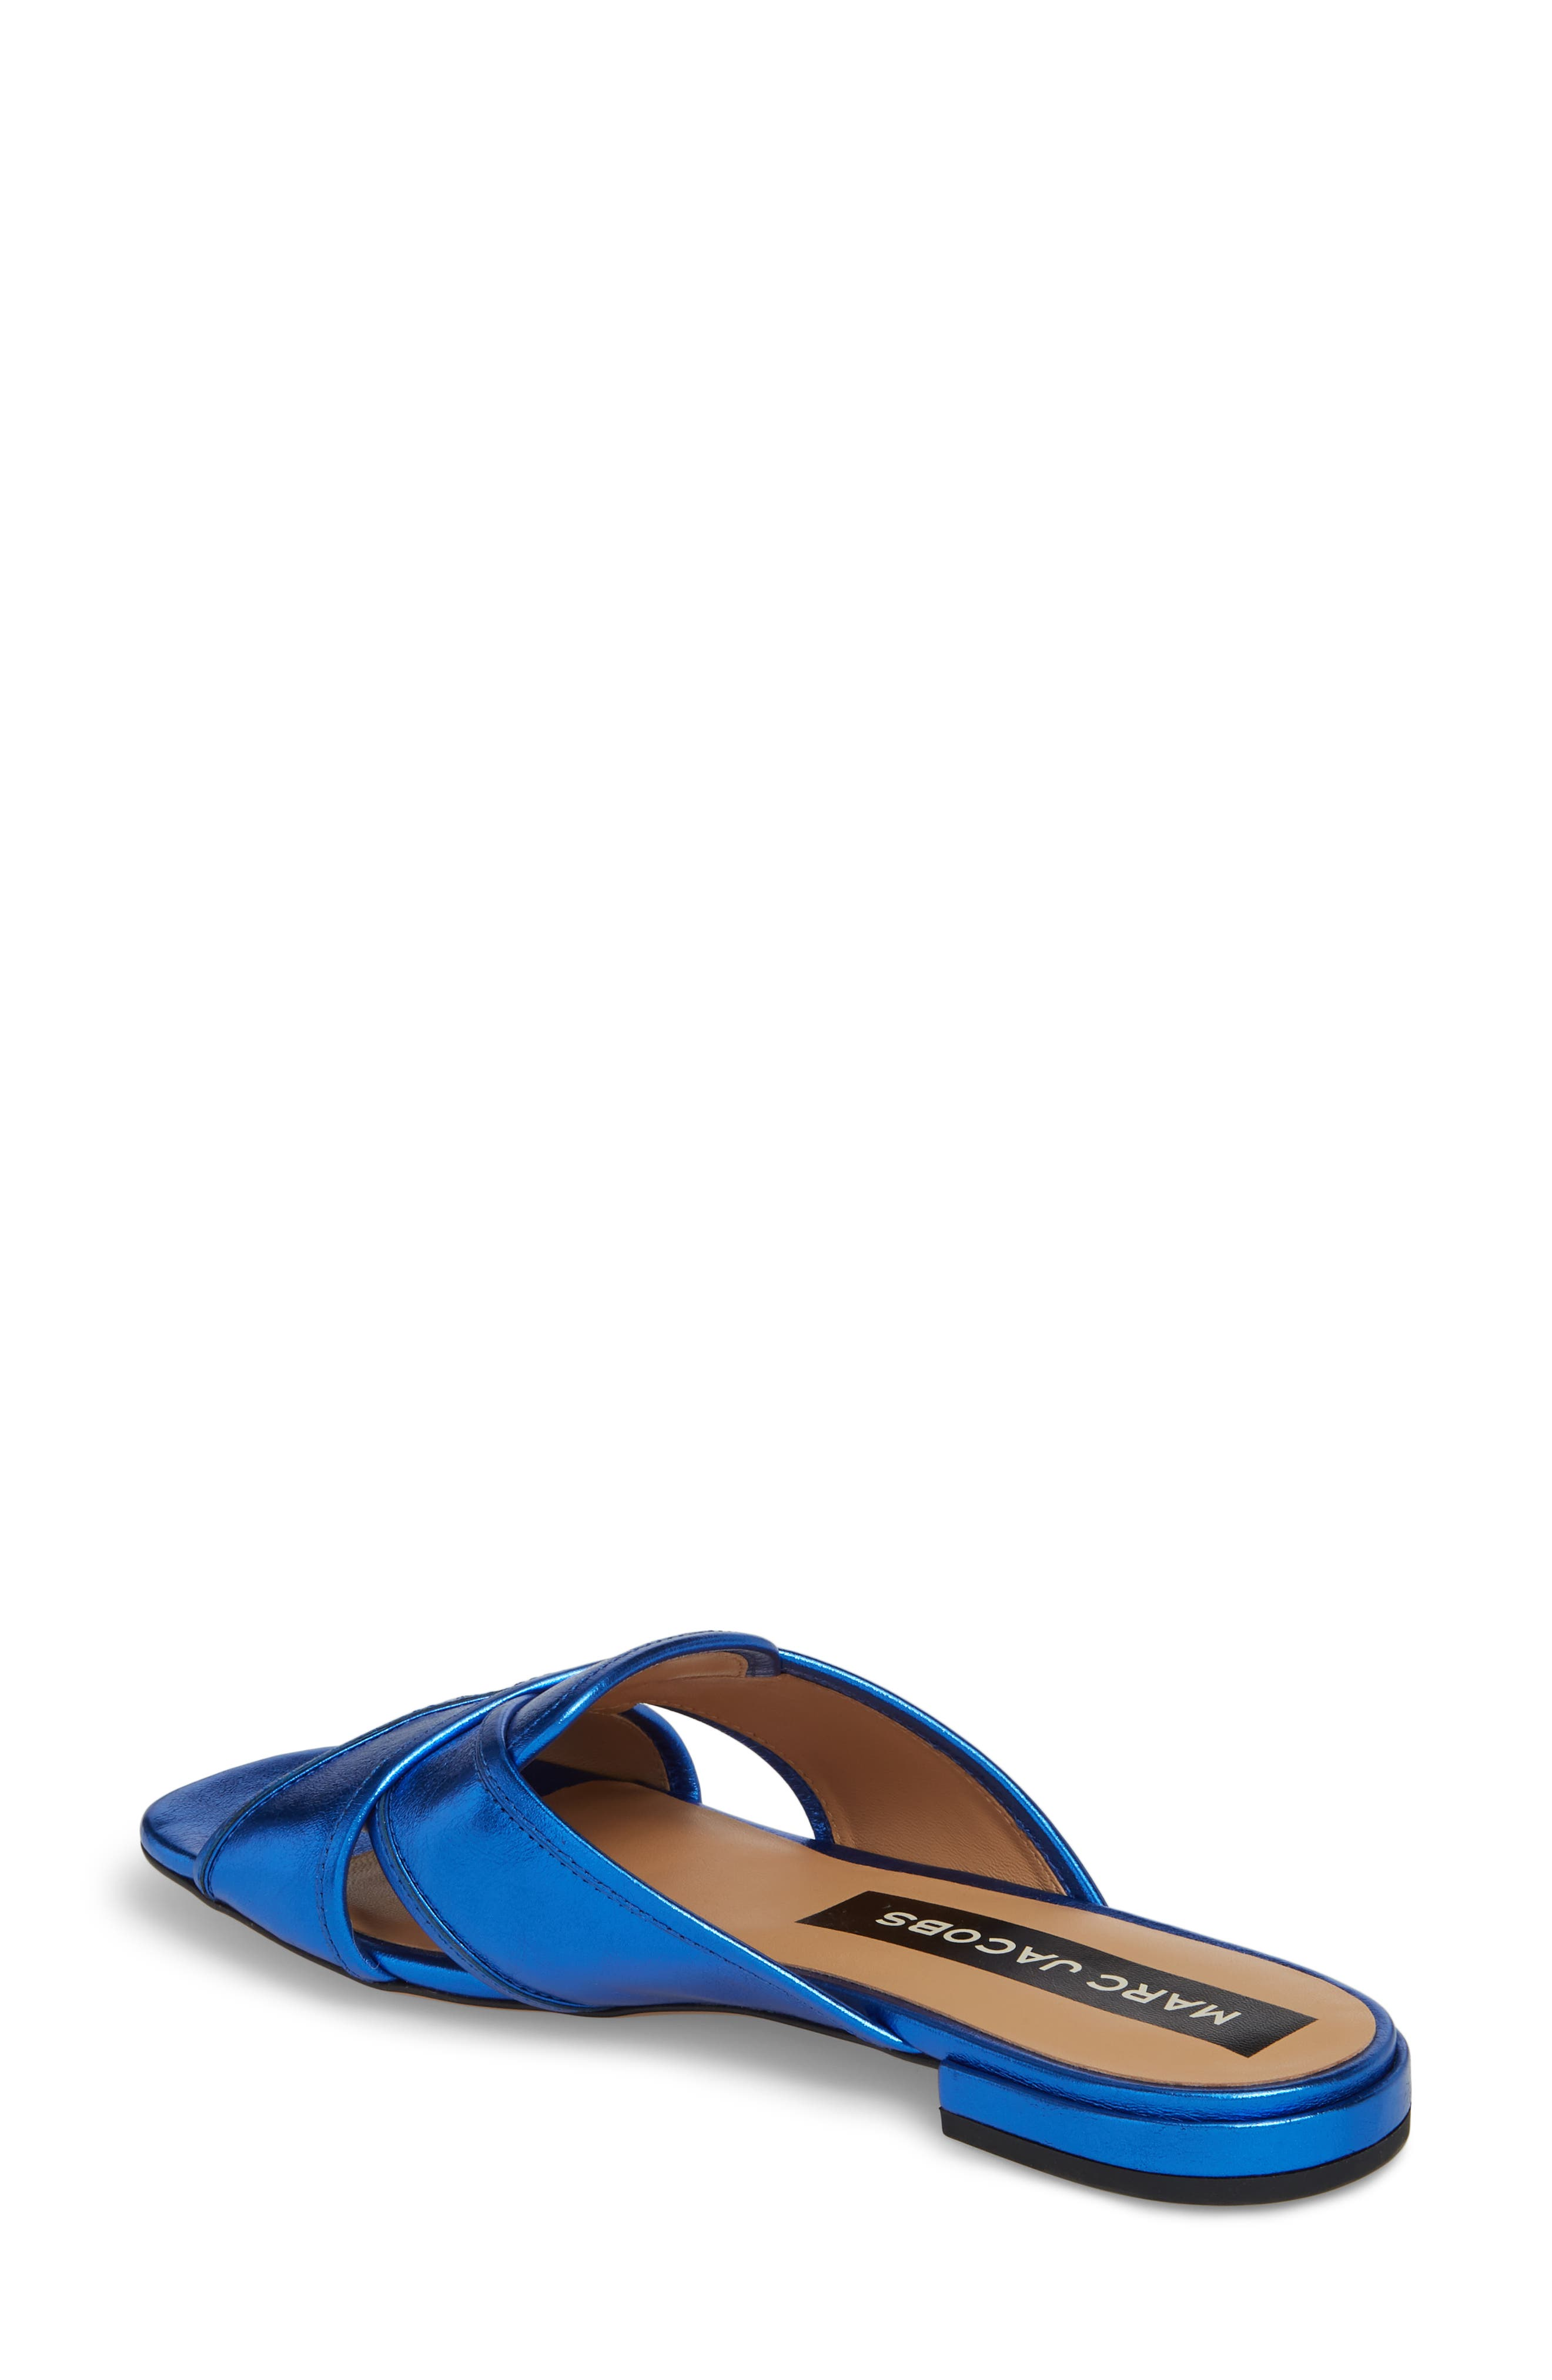 Aurora Metallic Slide Sandal,                             Alternate thumbnail 2, color,                             BLUE